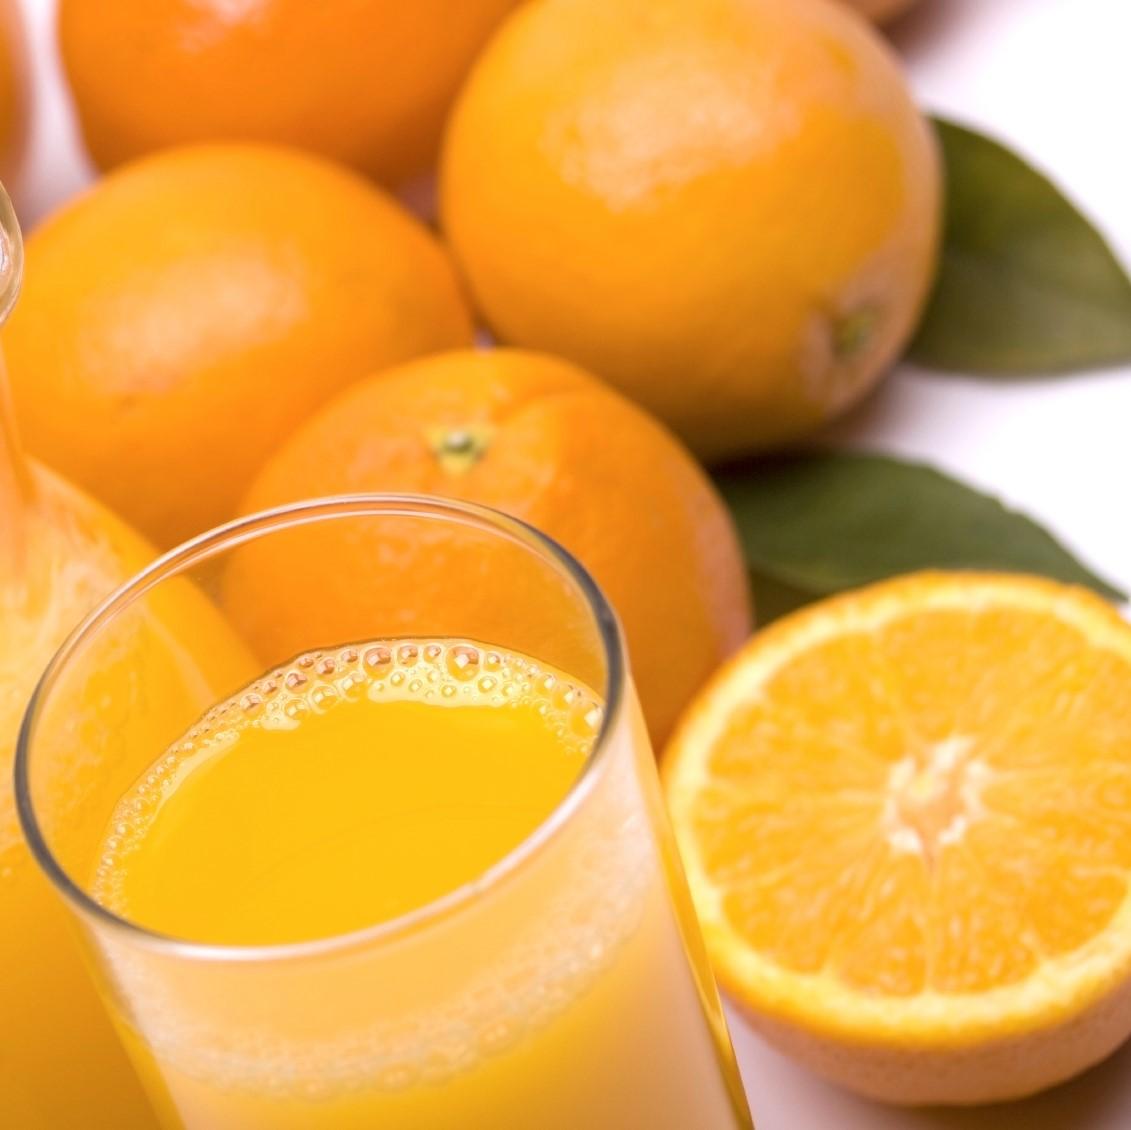 naranja zumo ecologica